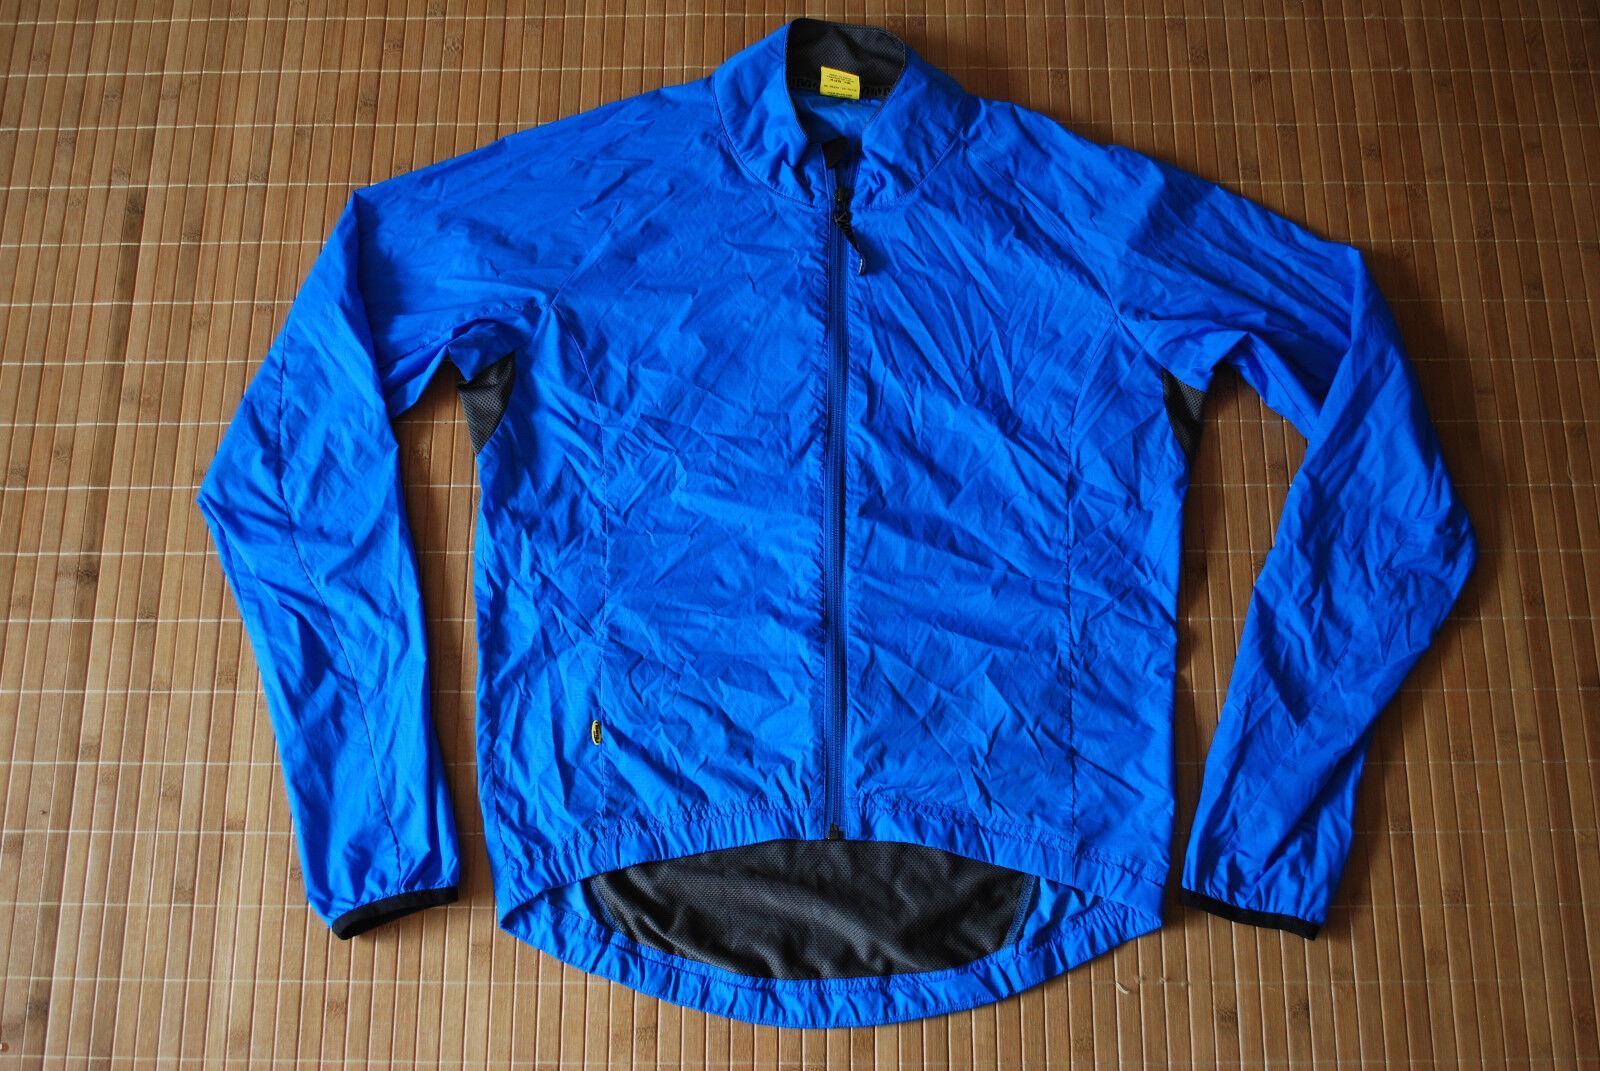 MAVIC DURAlite LUCE Ripstop Ciclismo BIKE Giacca Uomo L BIKE Ciclismo e6198b